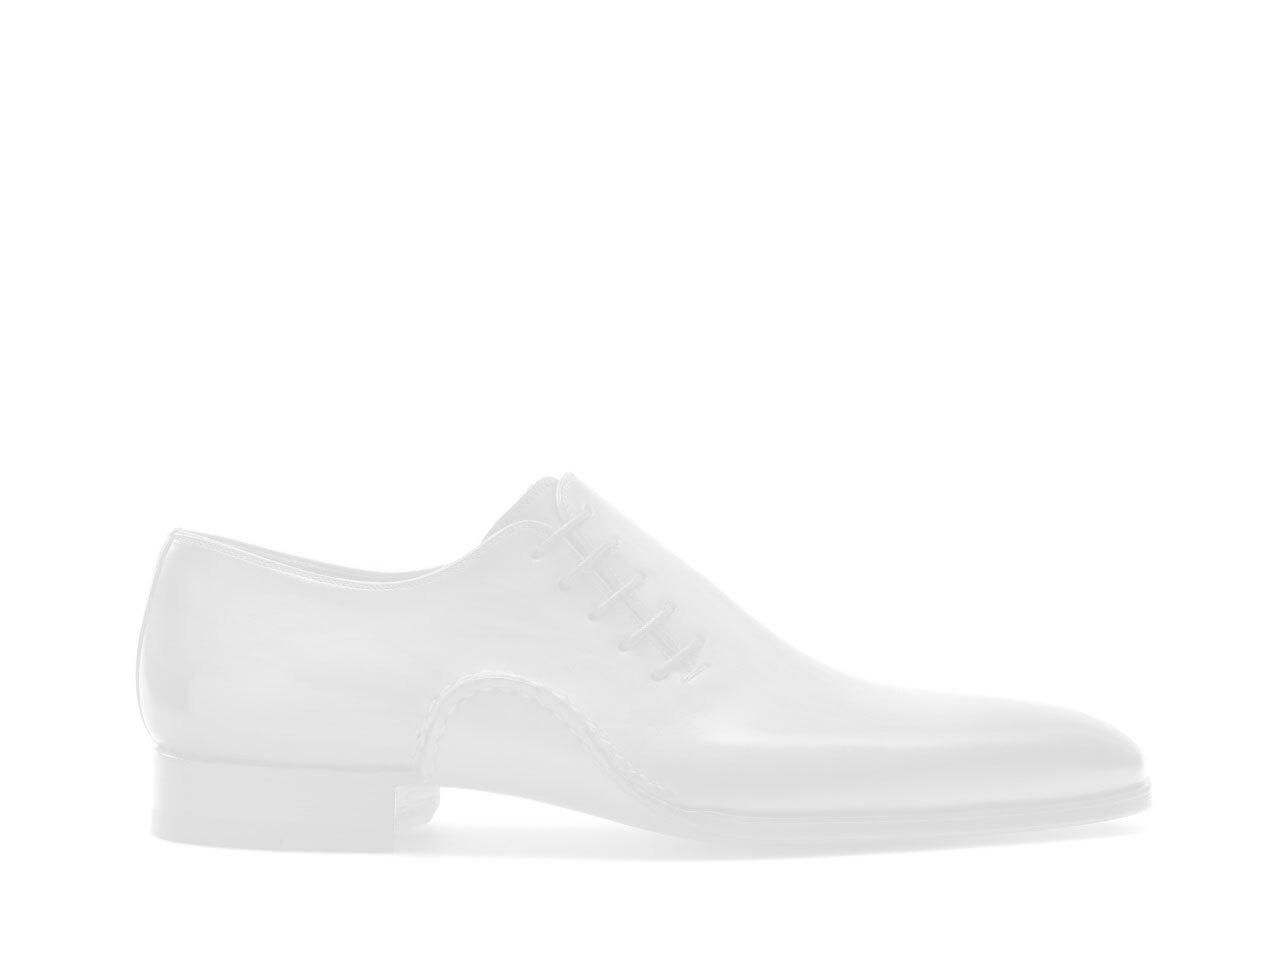 Navy blue suede lace up derby shoes for men - Magnanni